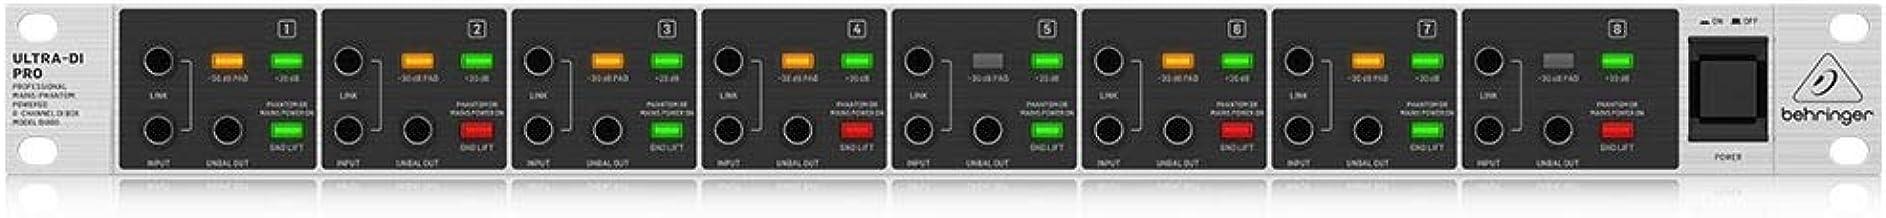 Behringer DI800 V2 Ultra-Di Pro Professional Mains/Phantom Powered 8-Channel DI-Box